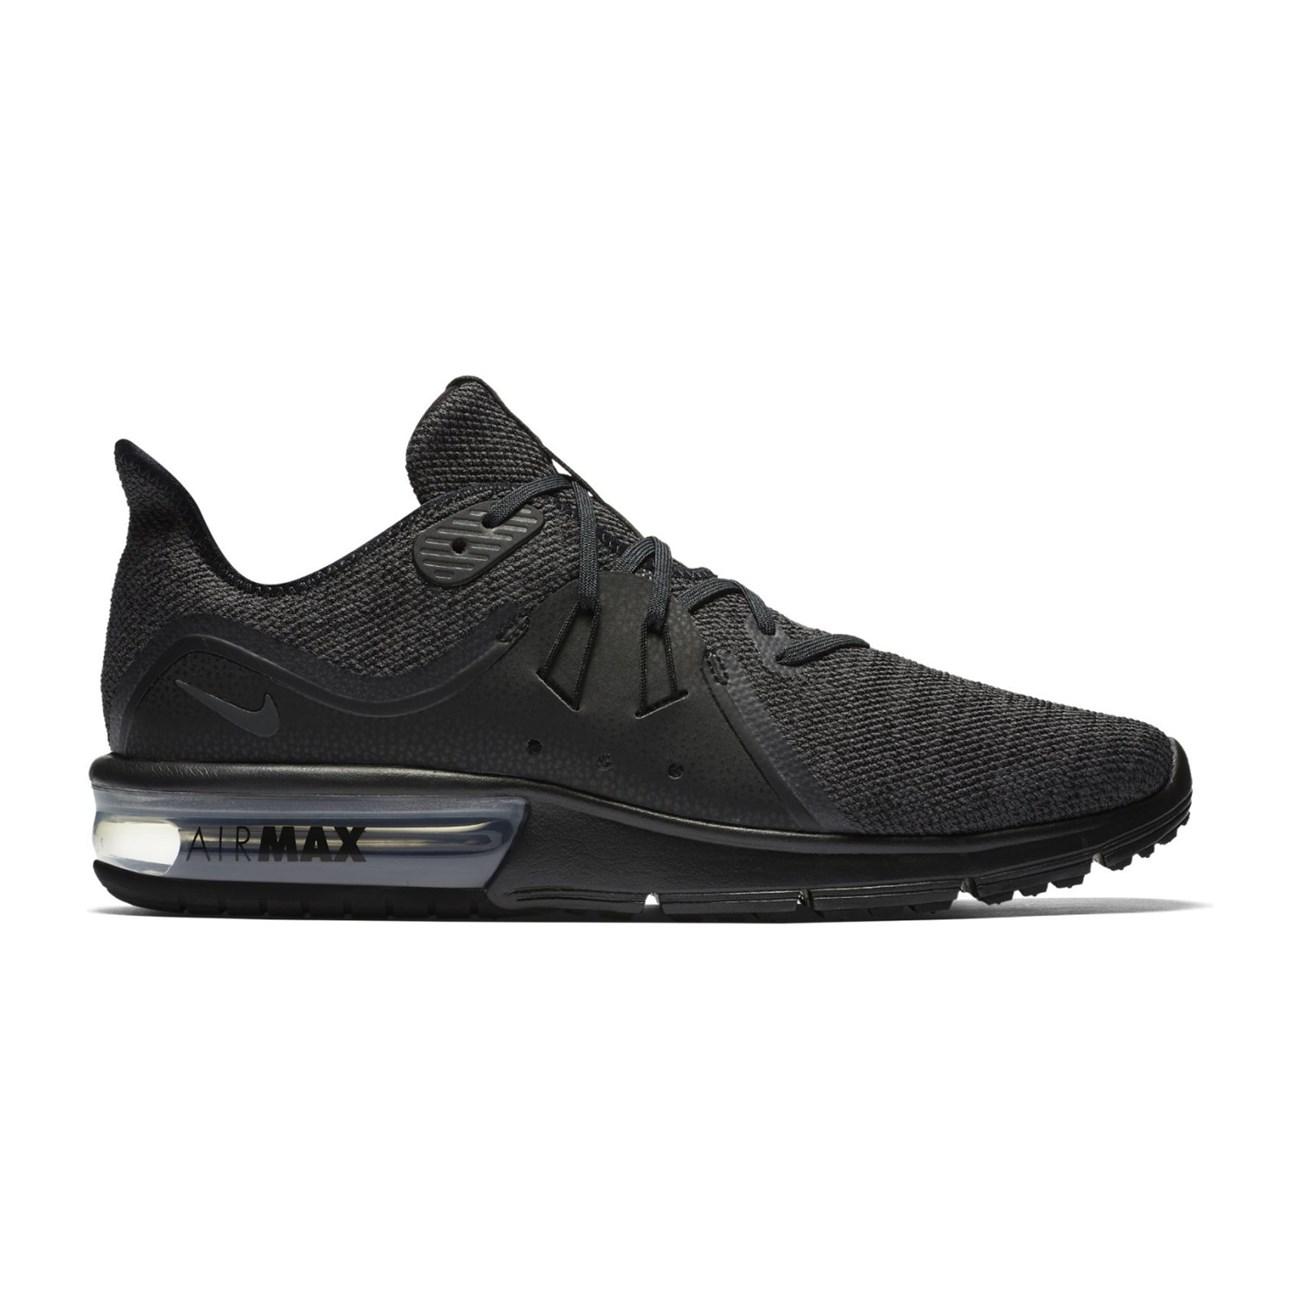 8706c011ea6 NIKE AIR MAX SEQUENT 3 < Παπούτσια για Τρέξιμο   INTERSPORT